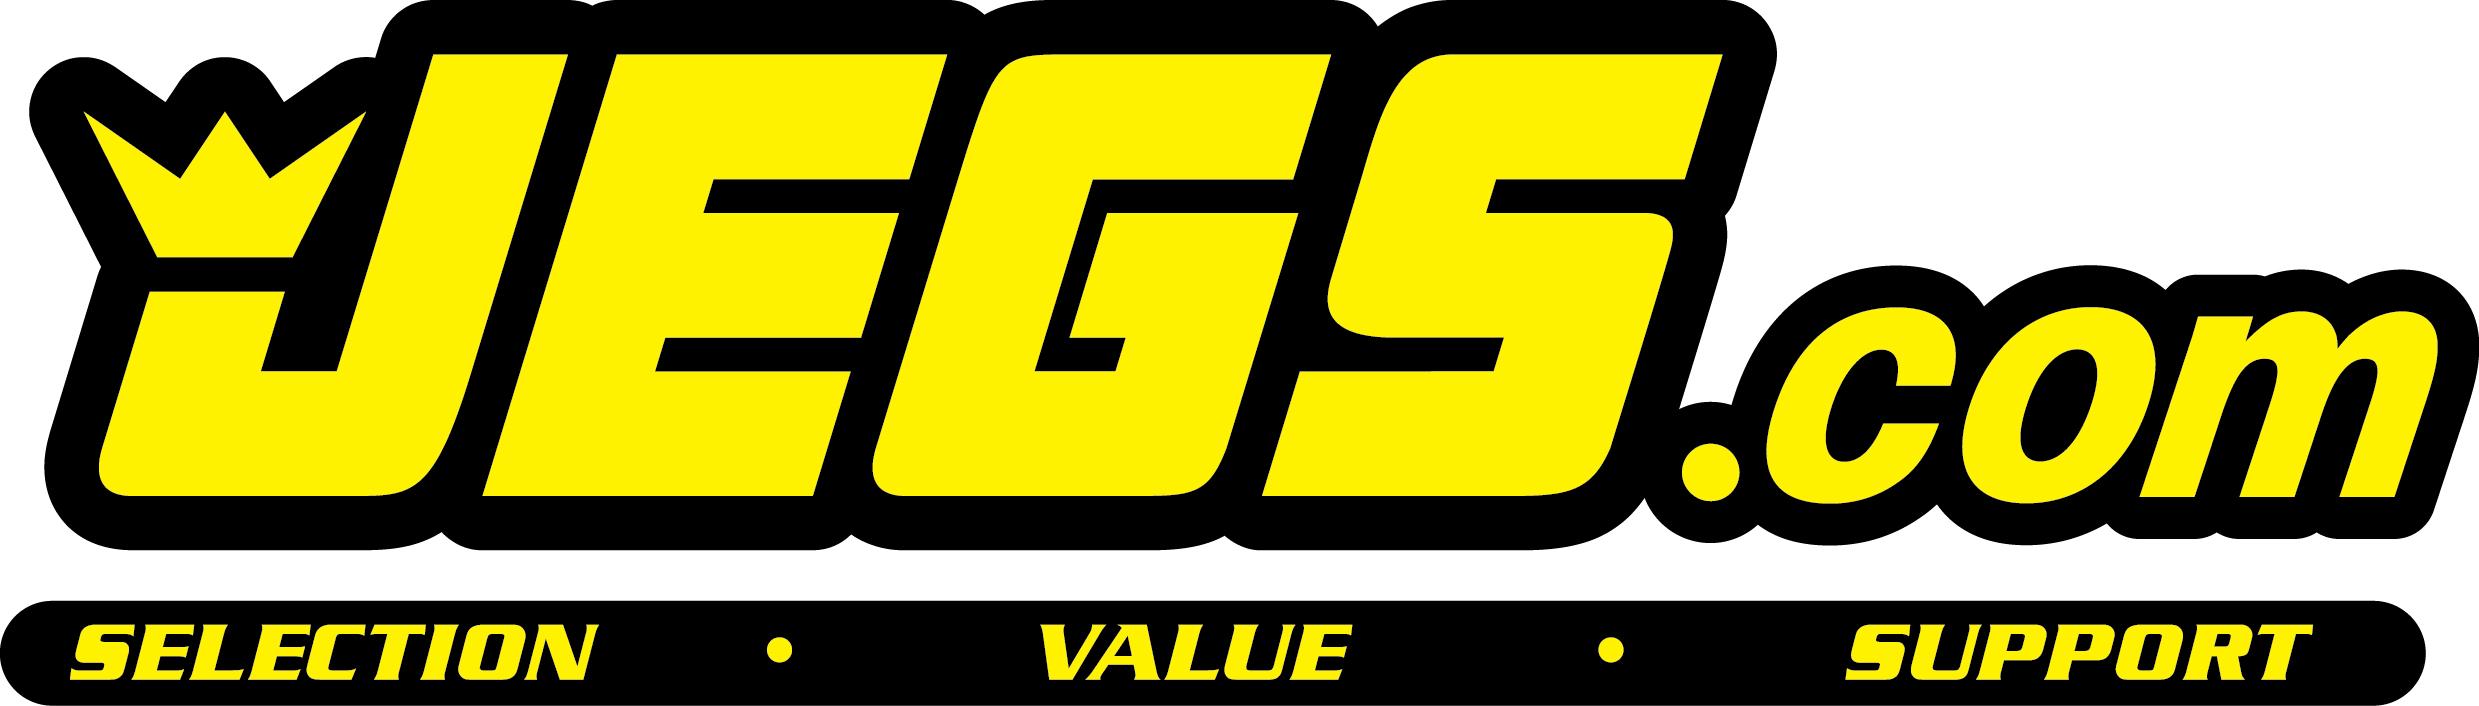 Logos & Brand Standards.